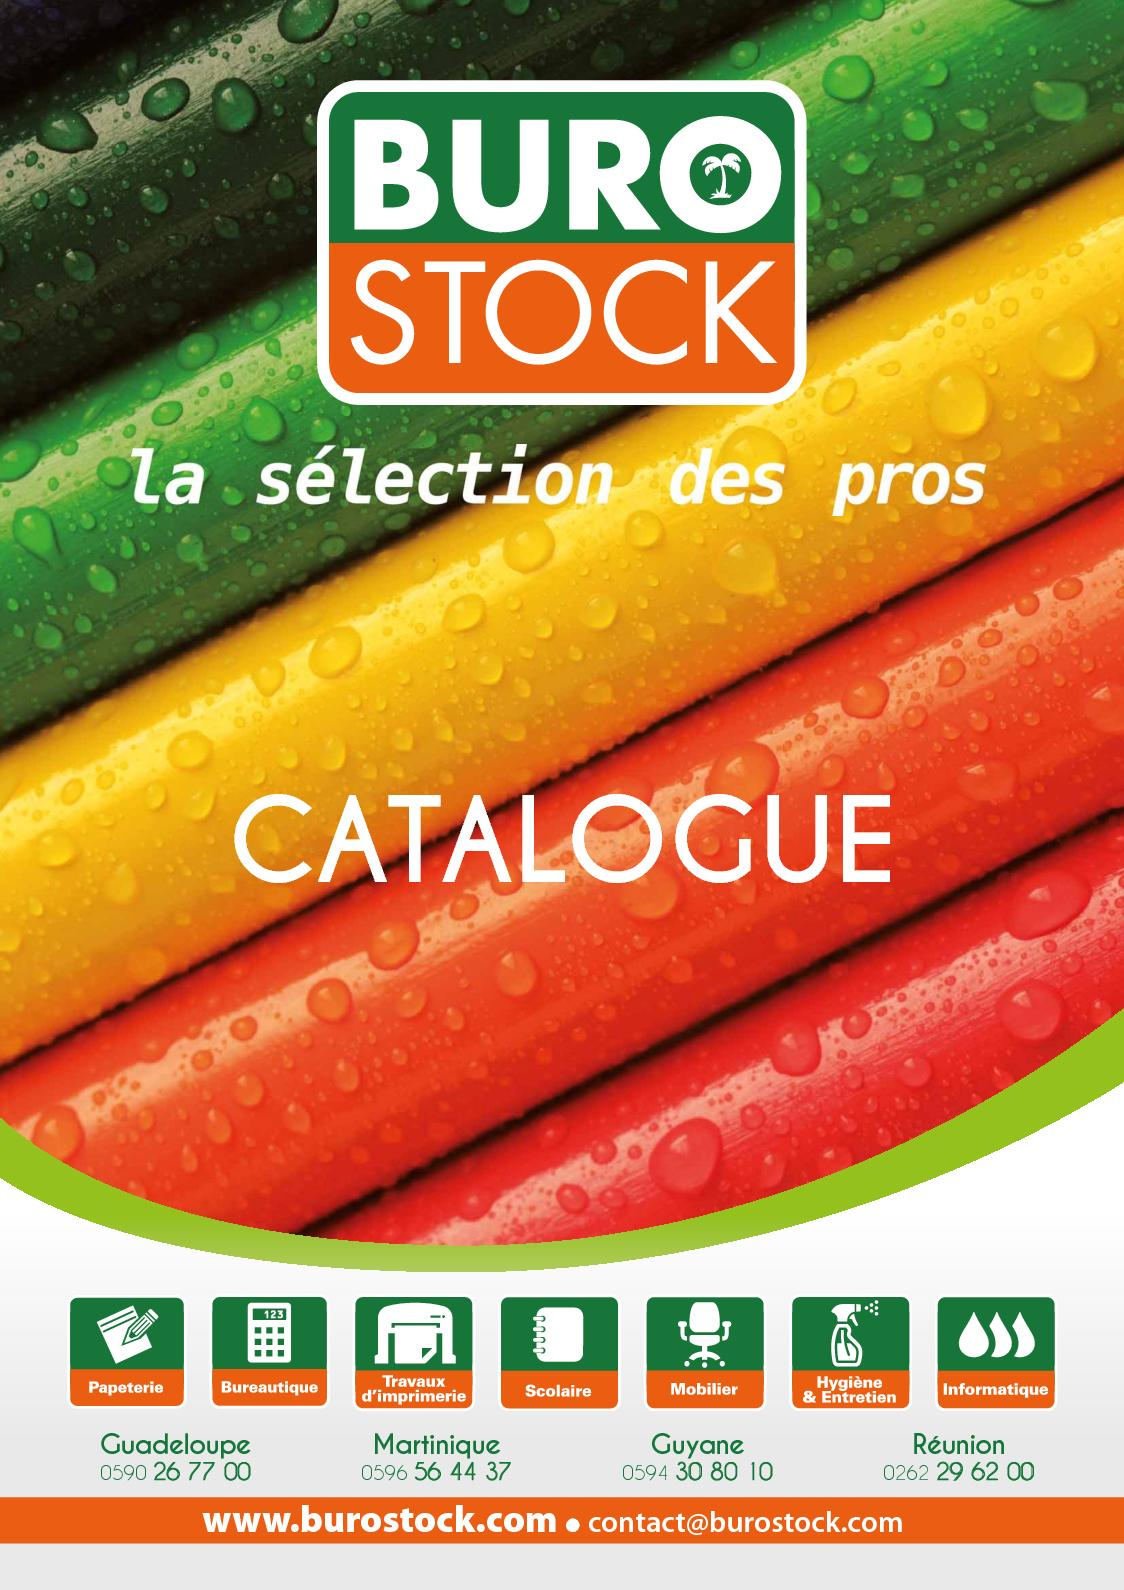 Catalogue Burostock Catalogue Burostock Calaméo Nouveau Catalogue Nouveau Nouveau Nouveau Calaméo Calaméo Calaméo Catalogue Burostock rhsQxdCt